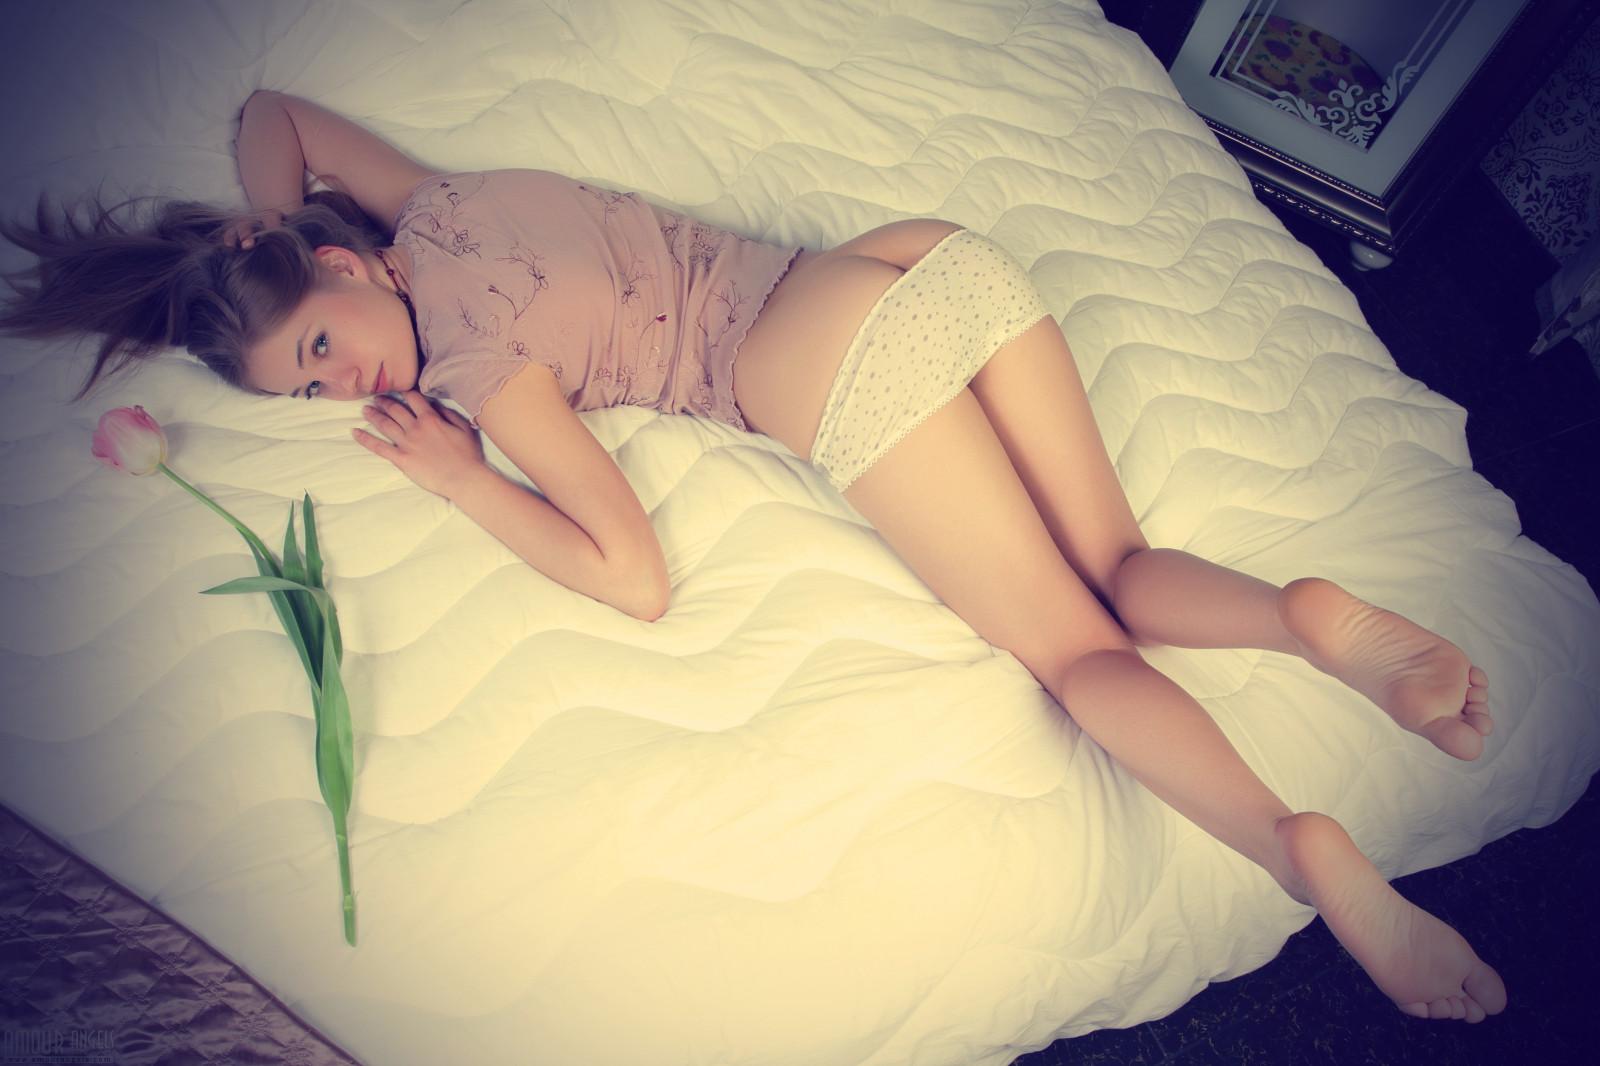 Claudia schiffer topless